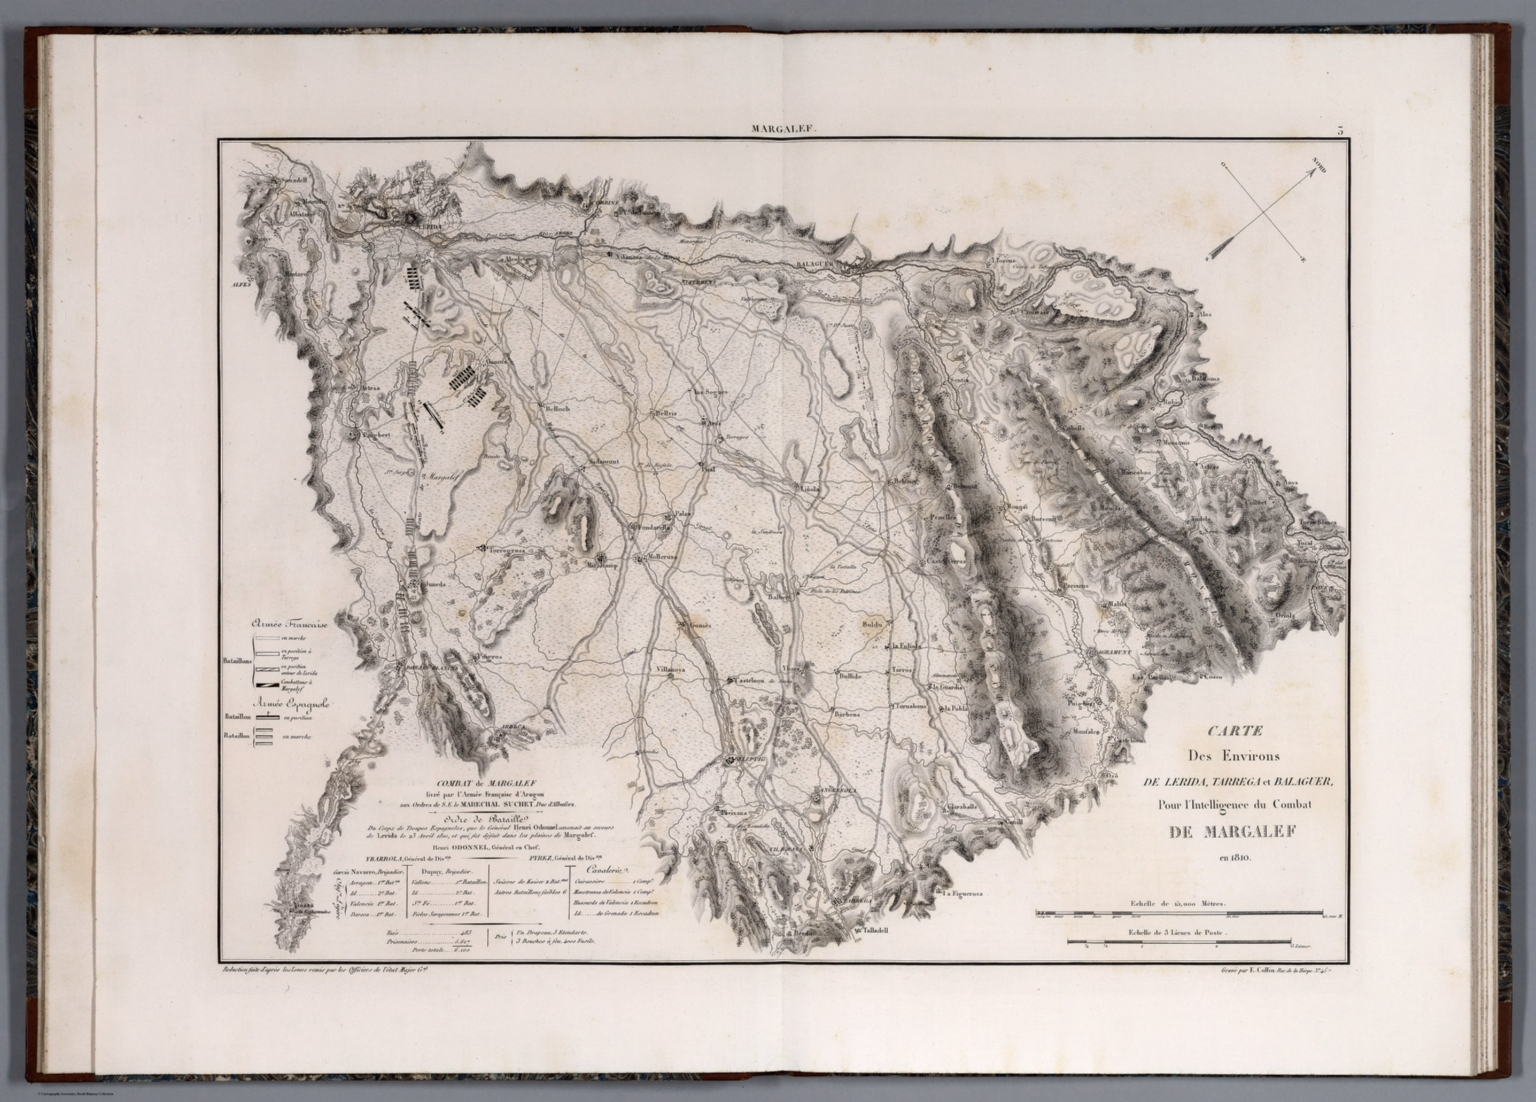 Carte Des Environs de Lerida, Tarrega et Balaguer ... in 1810.